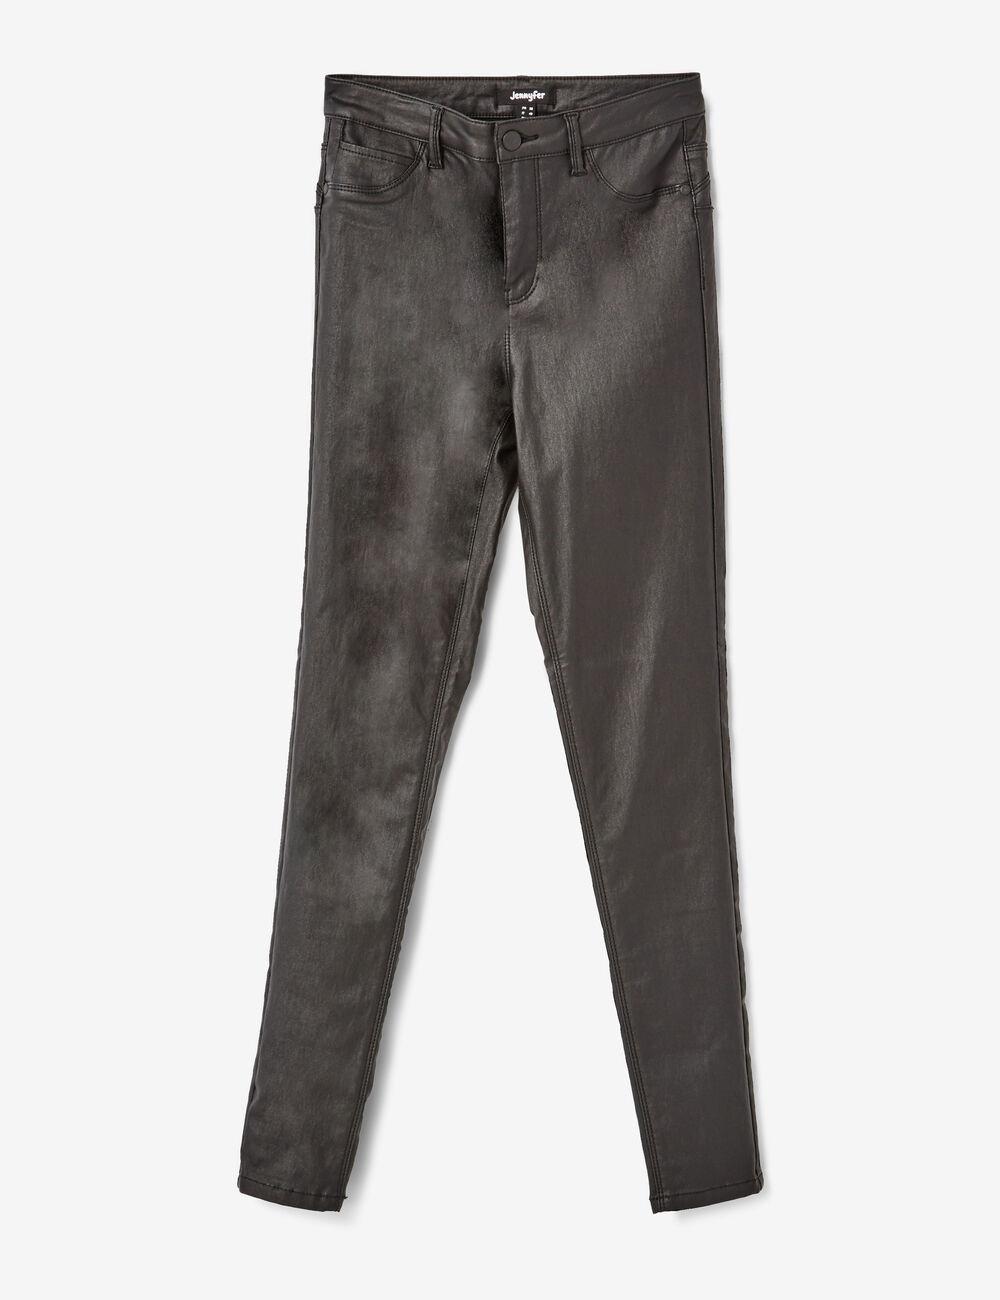 pantalon enduit taille haute noir femme jennyfer. Black Bedroom Furniture Sets. Home Design Ideas